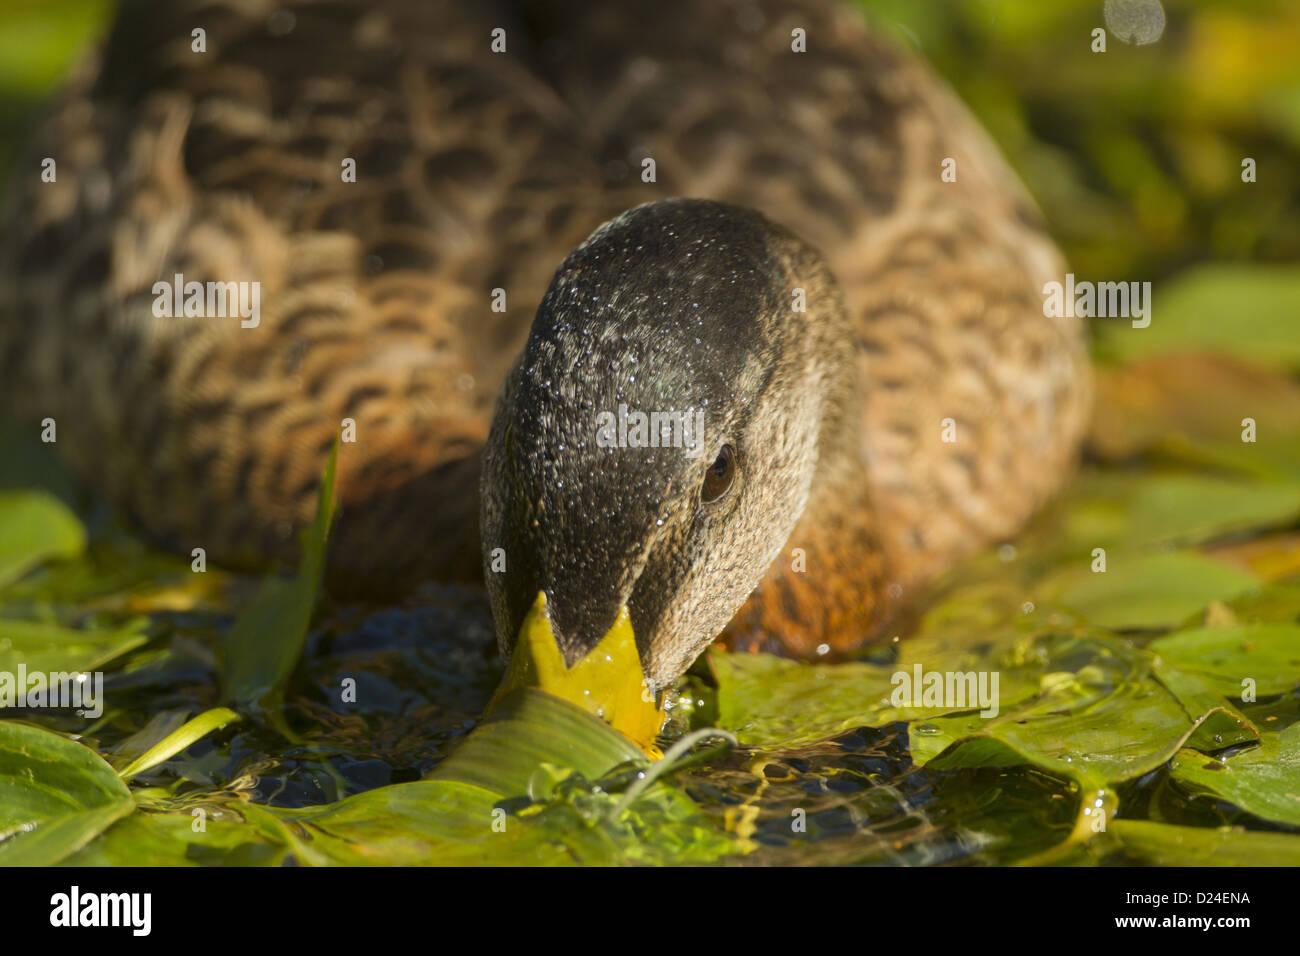 Domesticated Mallard Duck Stock Photos & Domesticated Mallard Duck ...